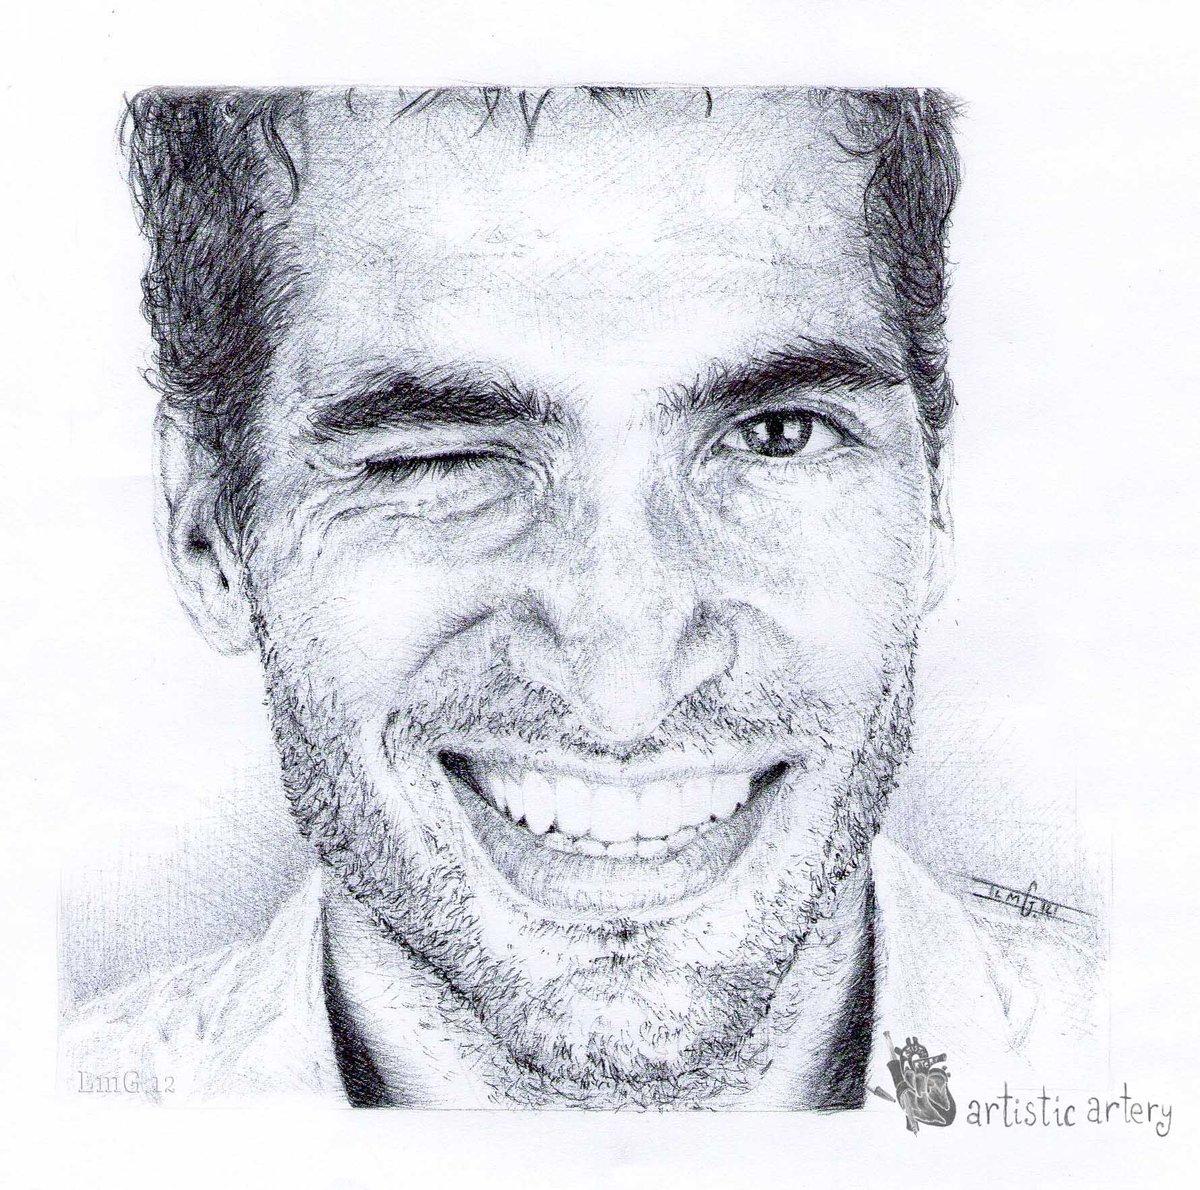 Gift for a friend. Ballpoint pen Ese canarito!  #crosshatching  #boli #Bic #ink #pen #artisticartery #ballpointpen #biro #art #illustration #drawing #sketch #pendrawing #portrait #boligrafo #dibujo #ballpointpendrawing #ballpointart #pensketch #realistic #ophthalmologists